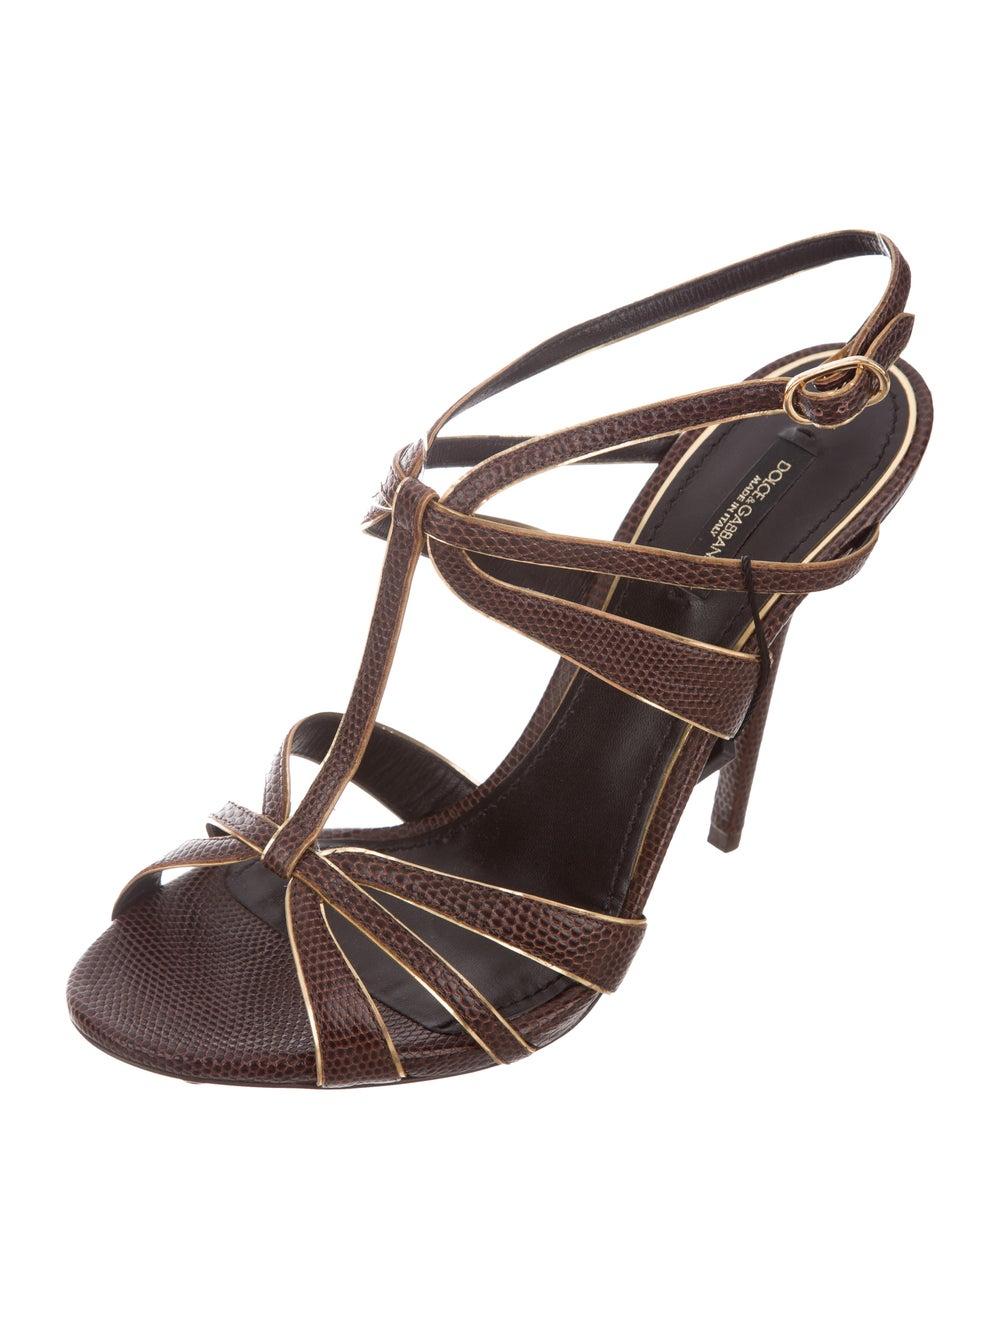 Dolce & Gabbana Lizard Strappy Sandals - image 2